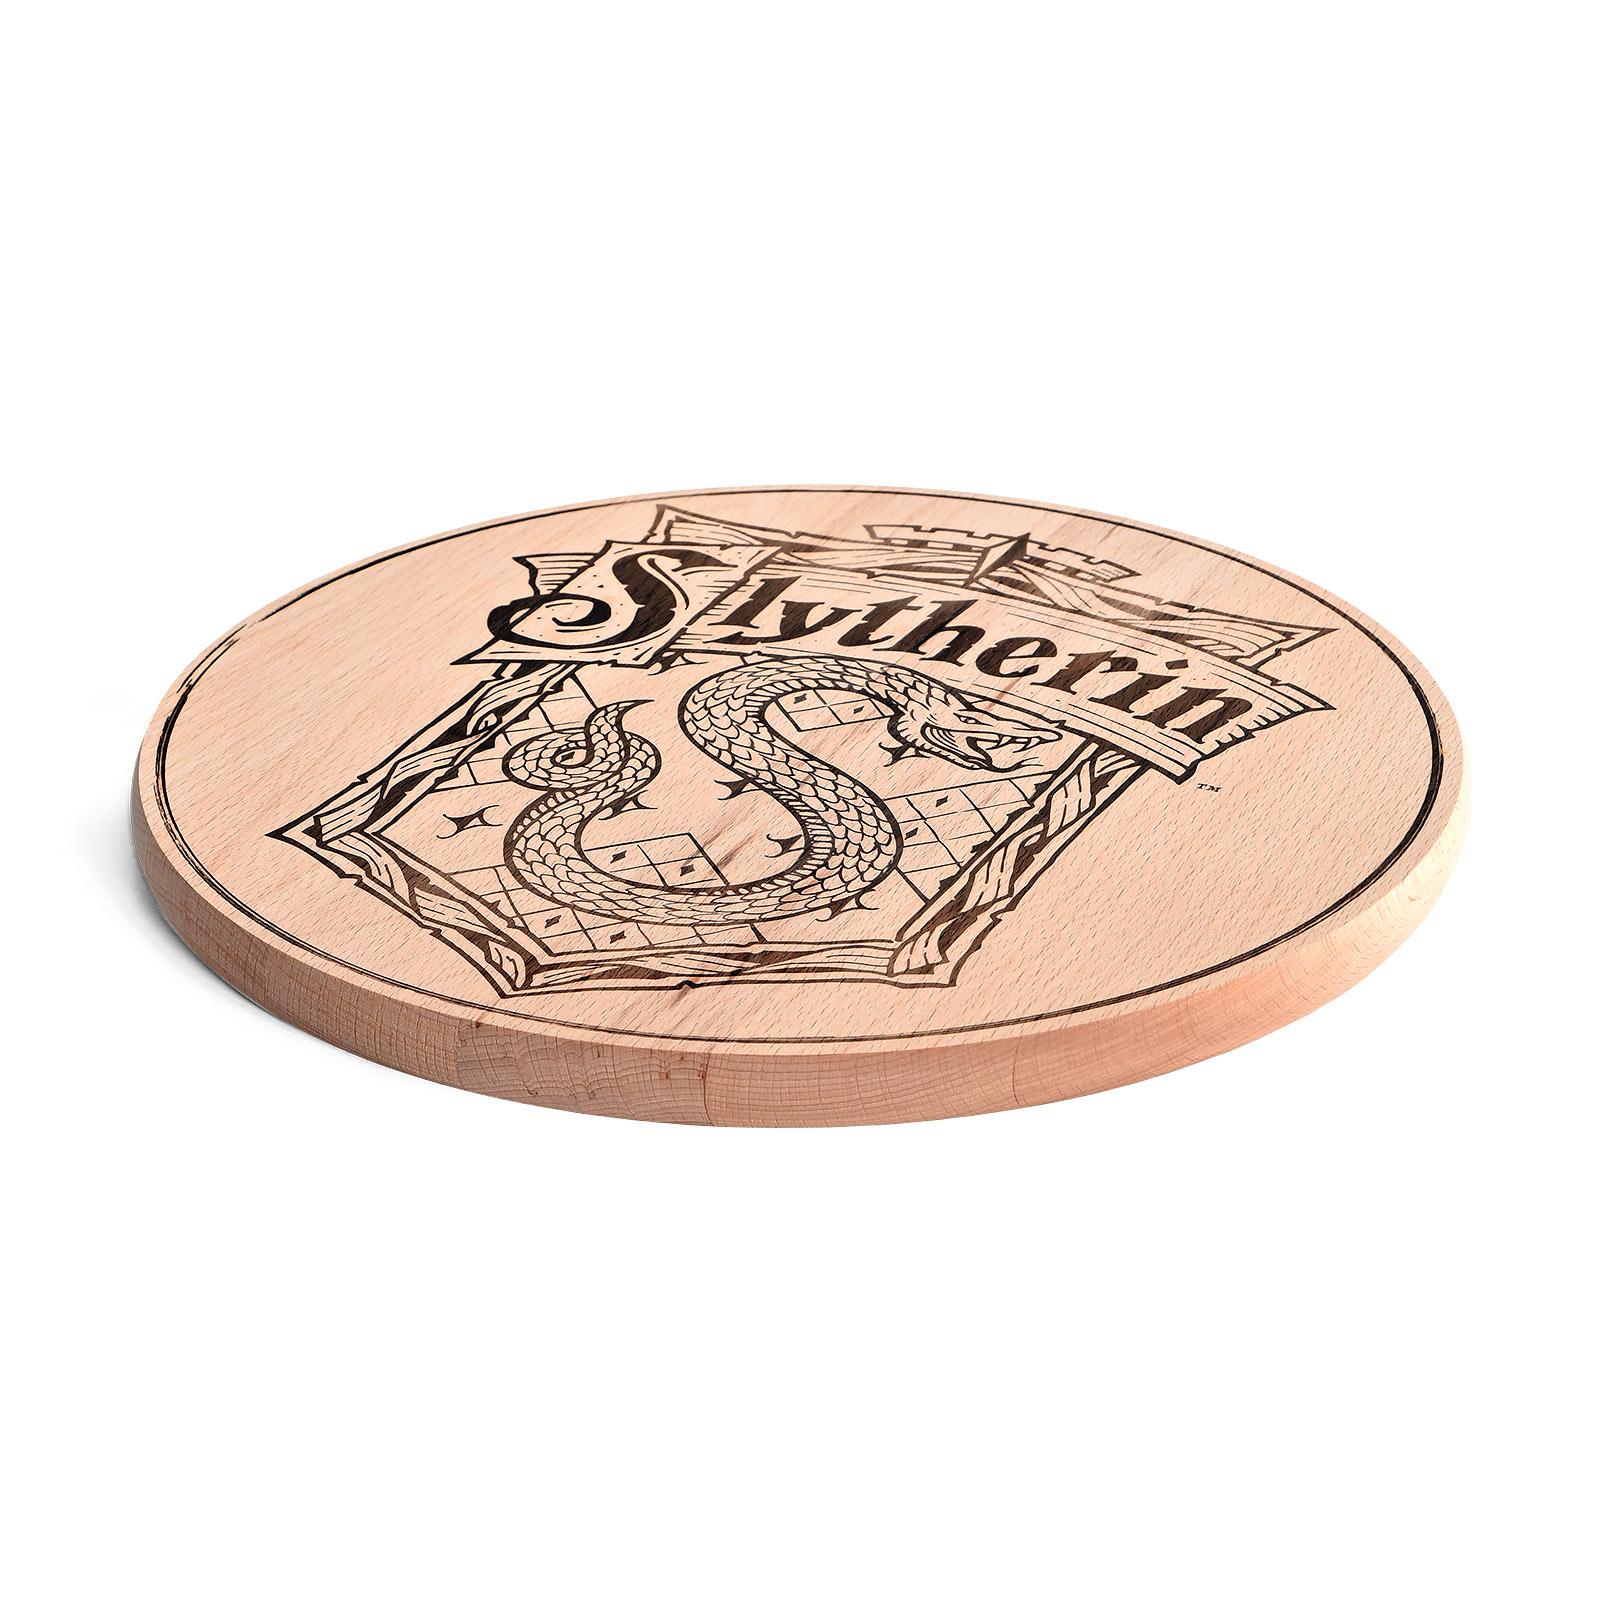 Harry Potter - Slytherin Wappen Schneidebrett Buche